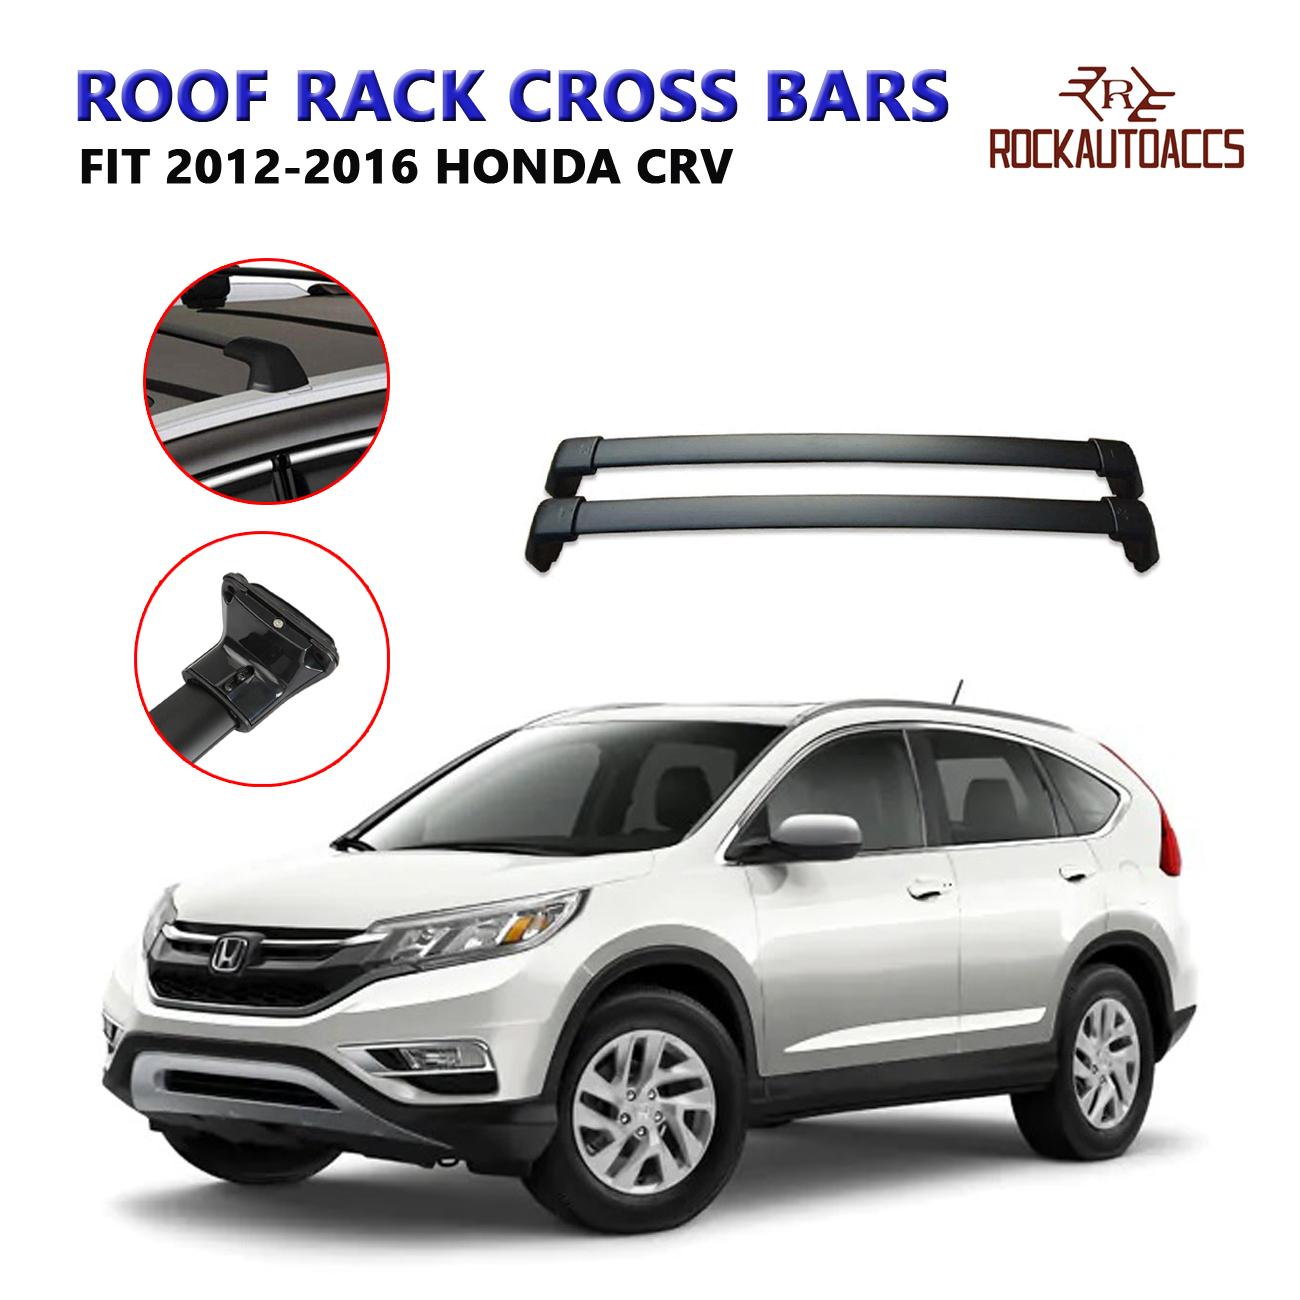 ROKIOTOEX Roof Rack Crossbars Roof Rail Cross Bars Fits 2018 2019 2020 Honda CRV with Side Rails Rooftop Kayak Cargo Bag Holder Luggage Carrier Aluminum Silver